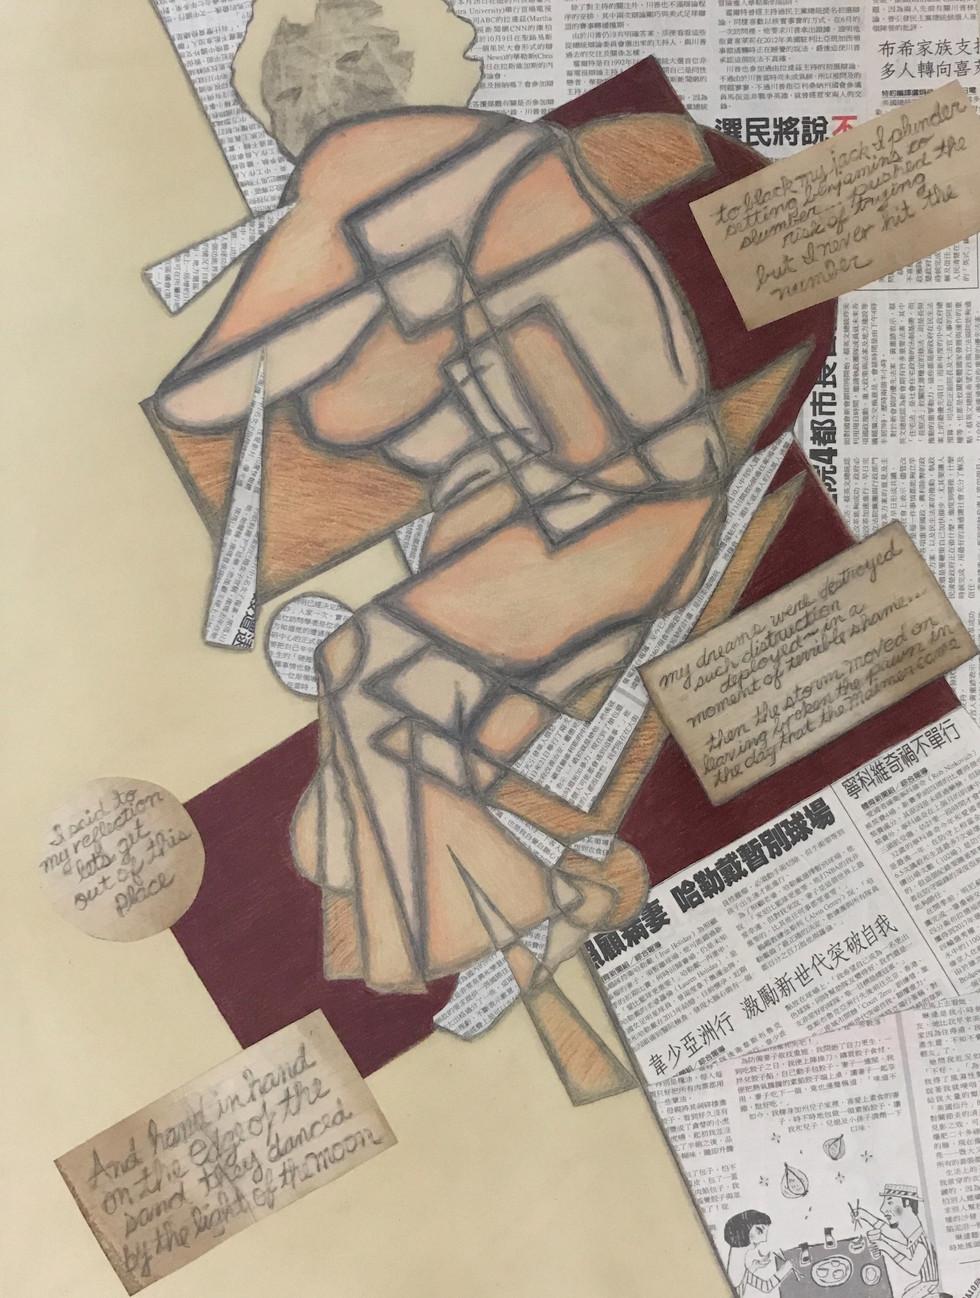 Demetri Fisher art - mother drawing